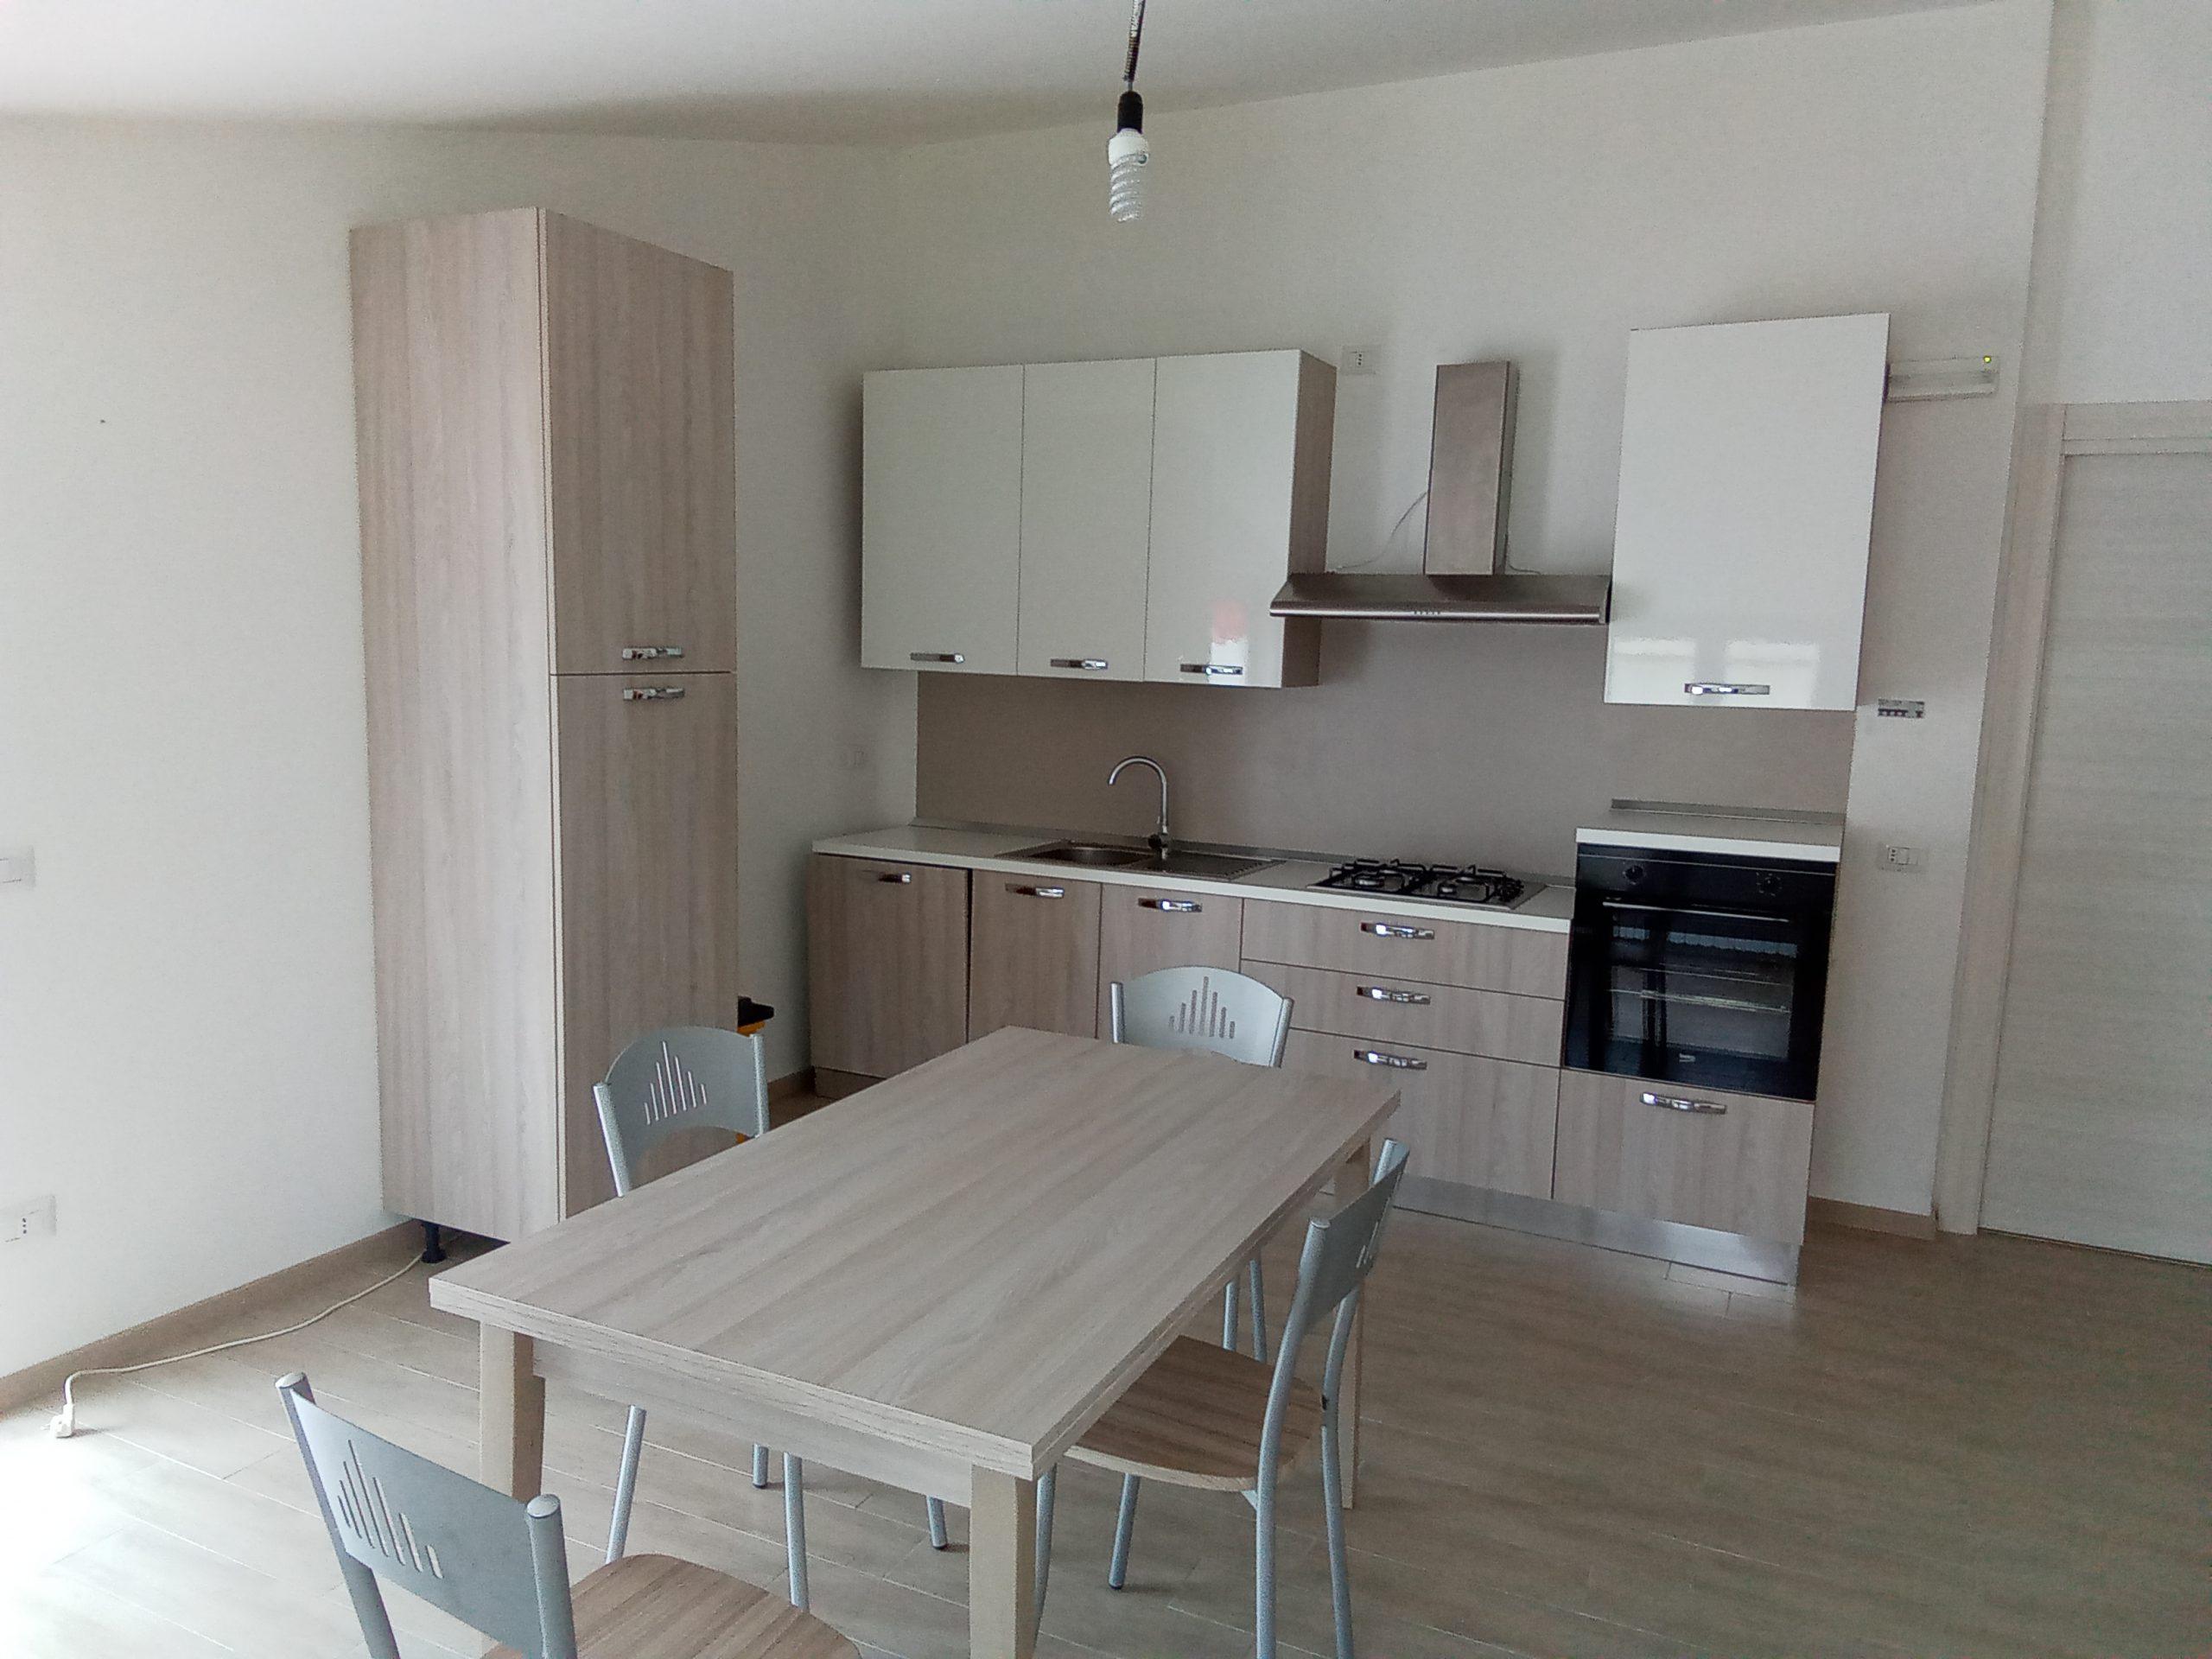 Locasi appartamento arredato Tramutola (PZ)